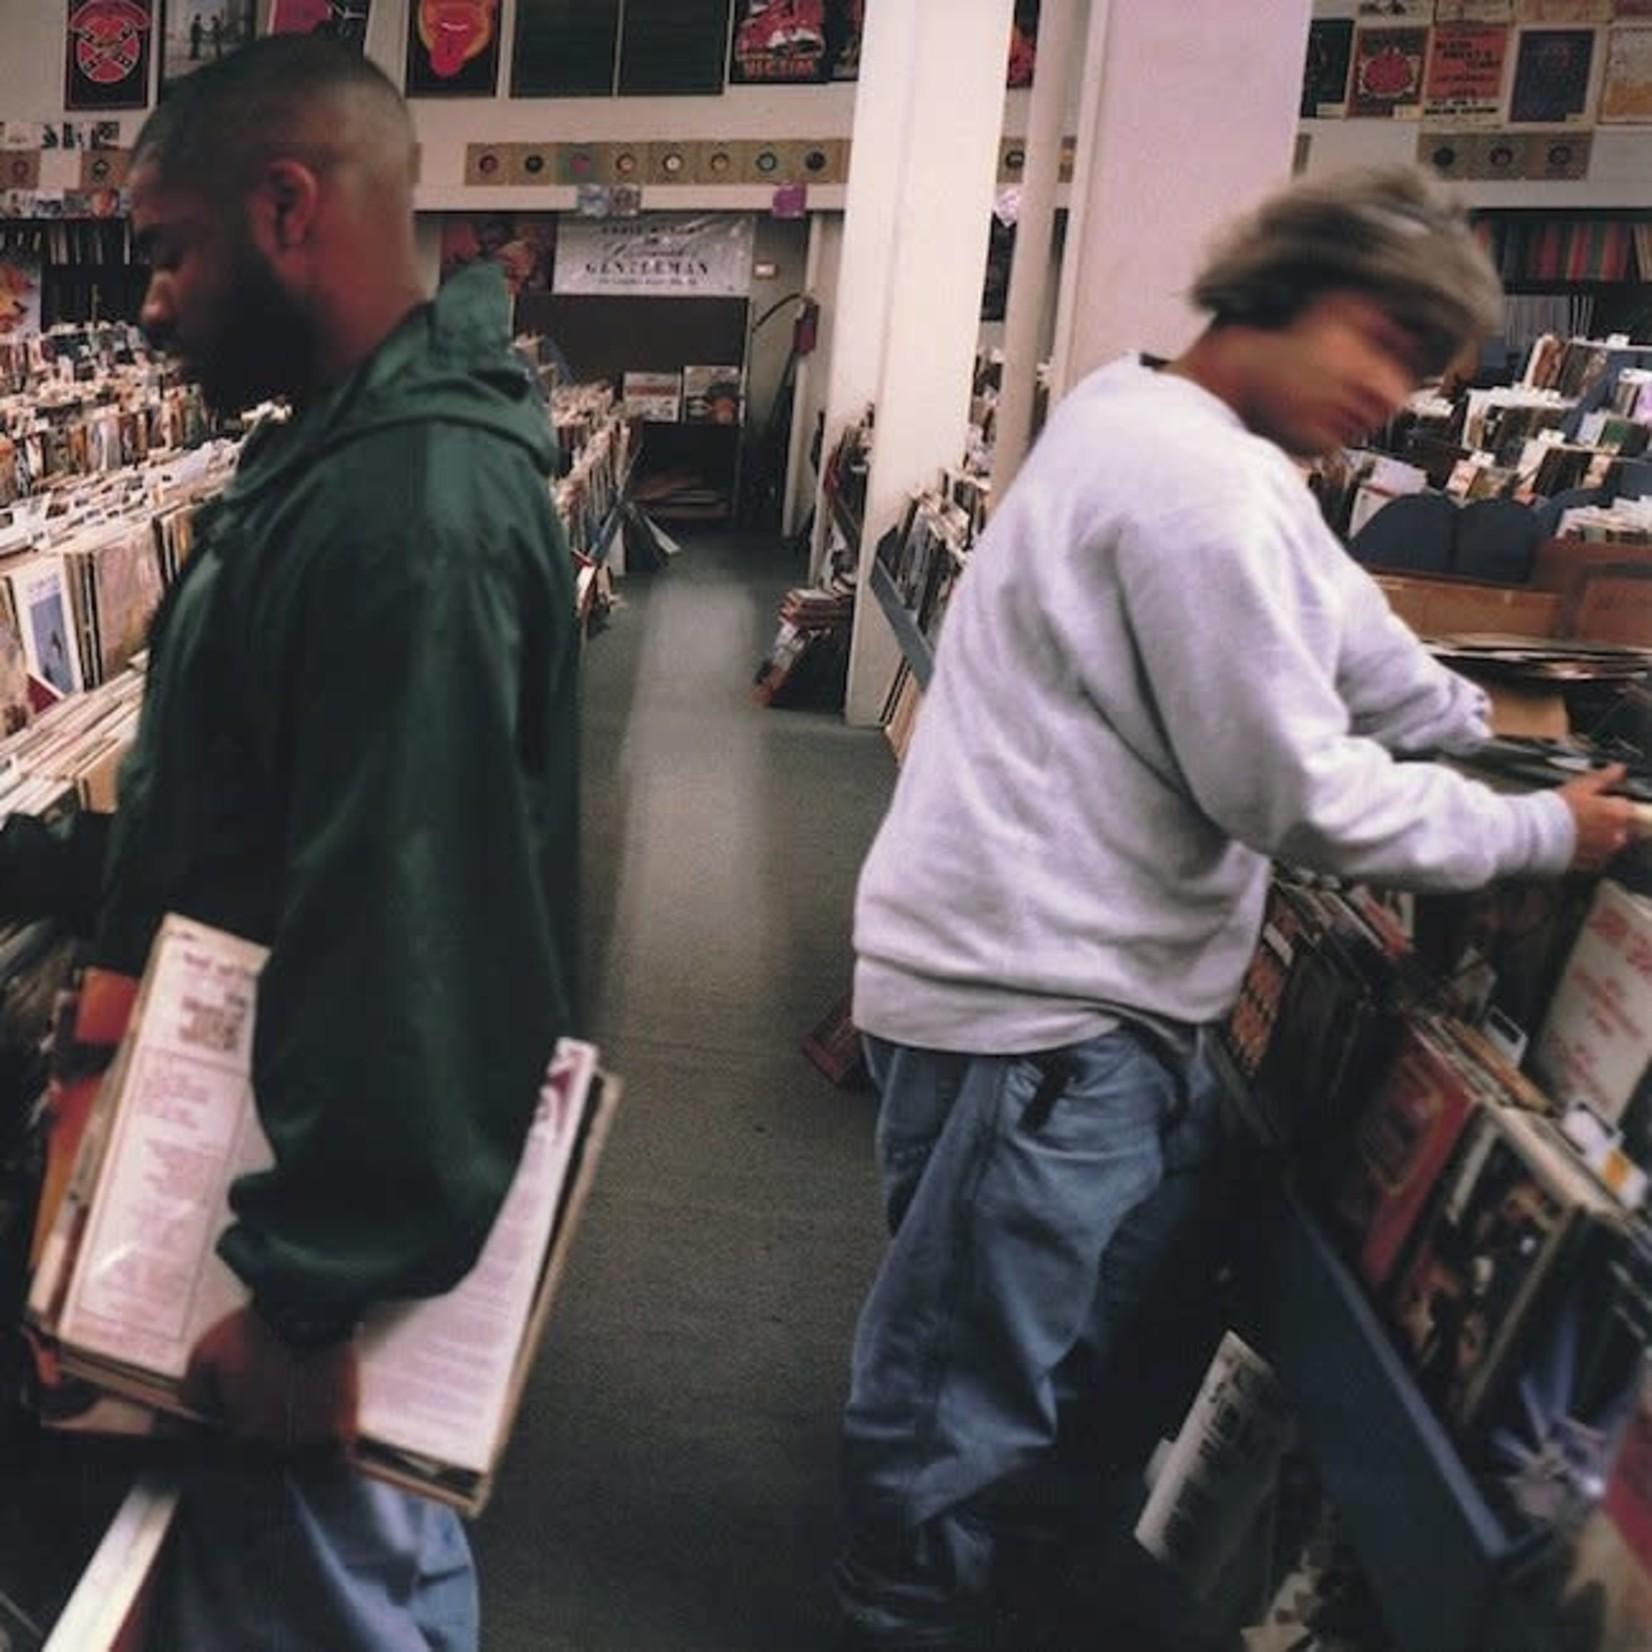 [New] DJ Shadow: Endtroducing (2LP)